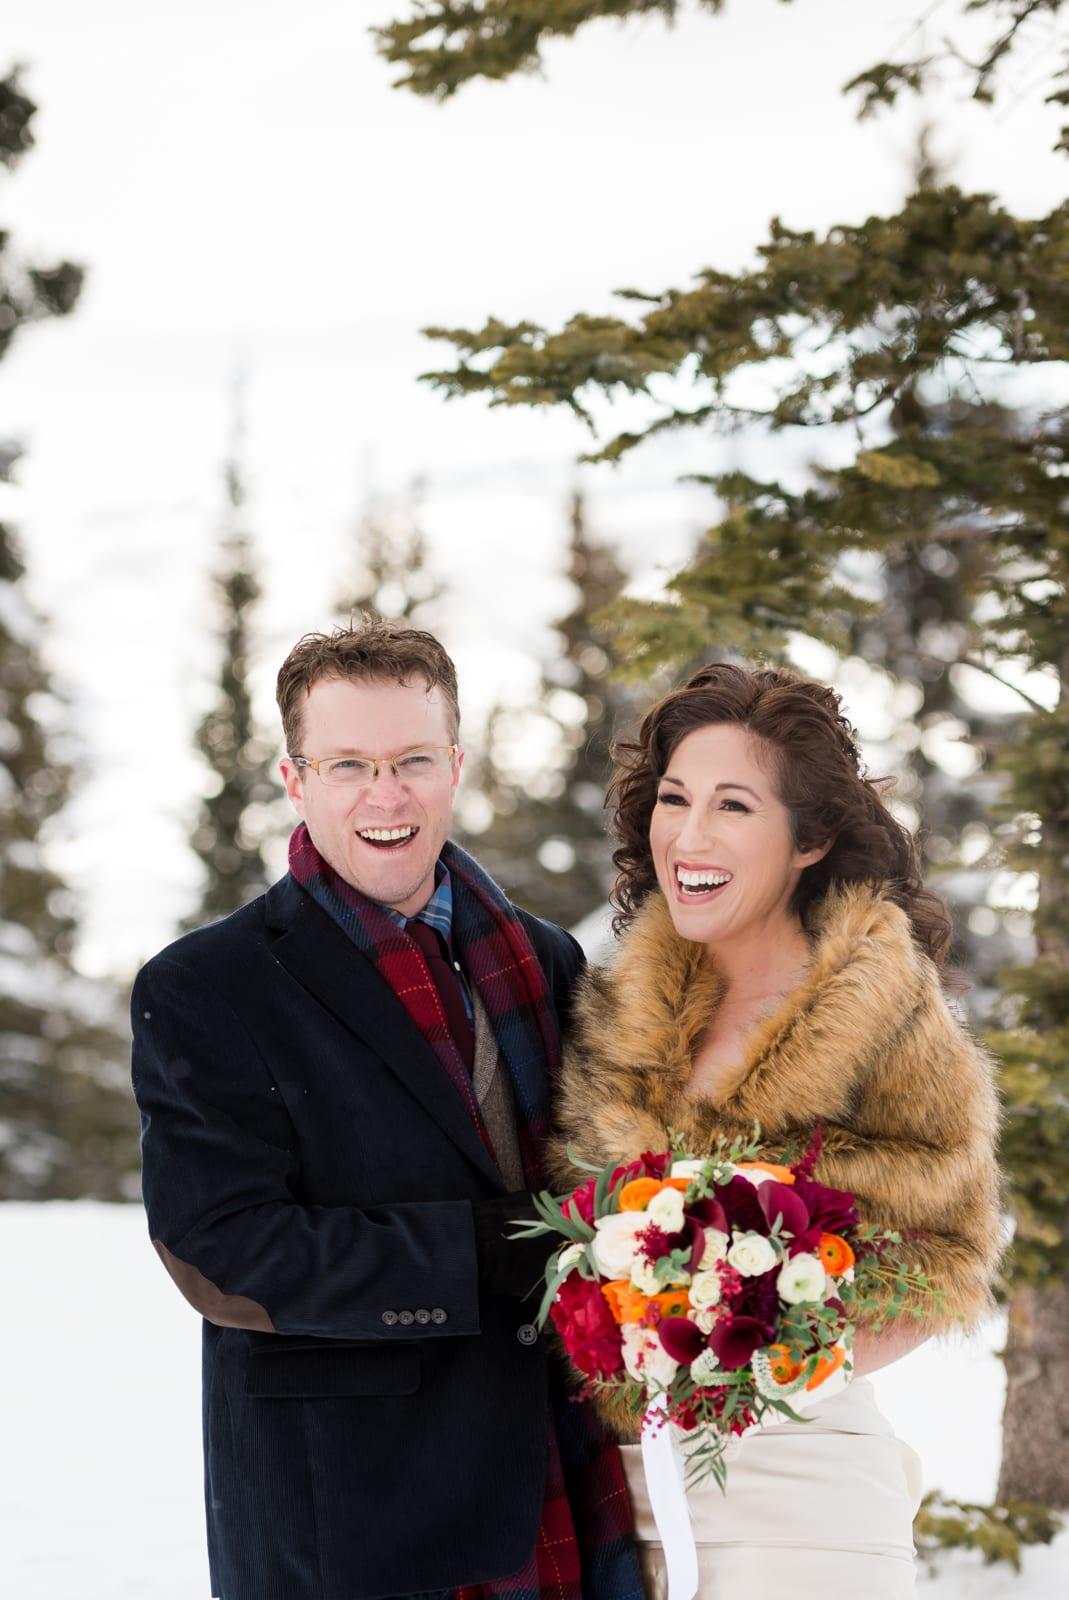 Beaver Creek Wedding | Wedding Photography | Beaver Creek, Colorado | From The Hip Photo